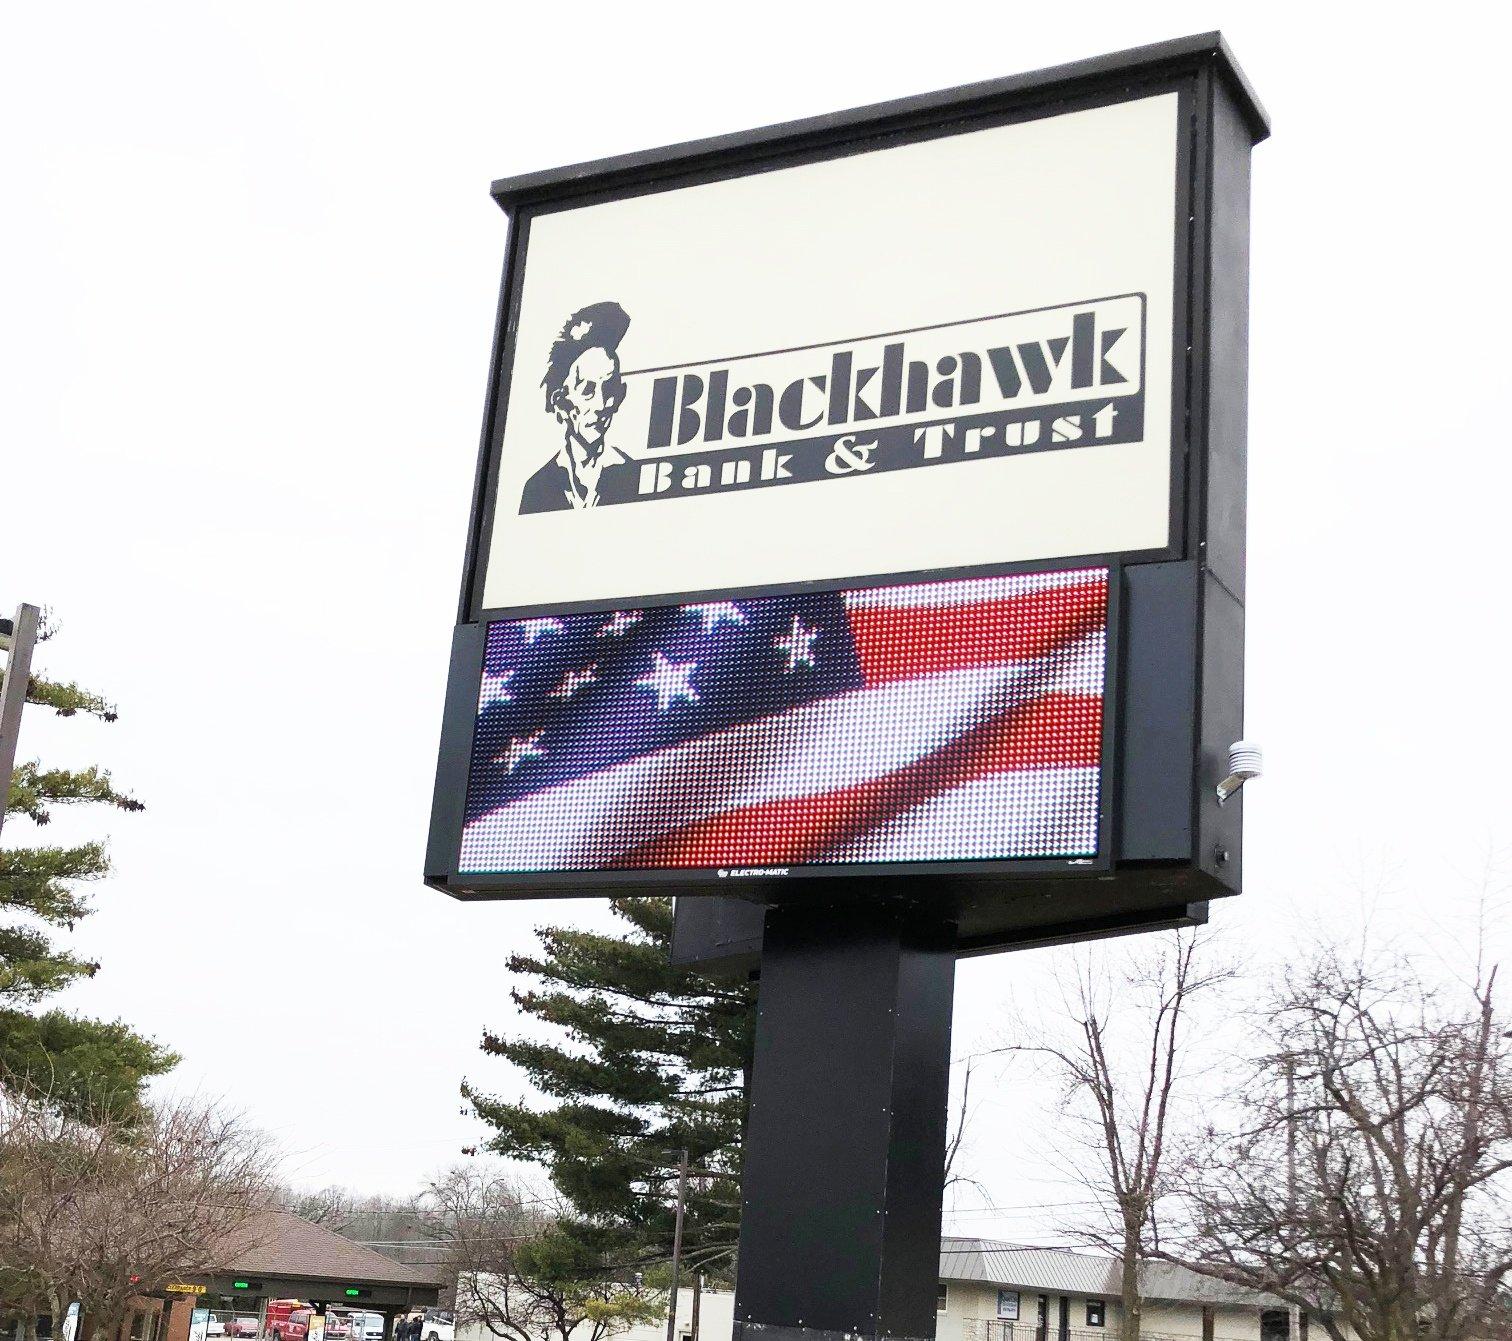 Blackhawk_Bank_Newsletter